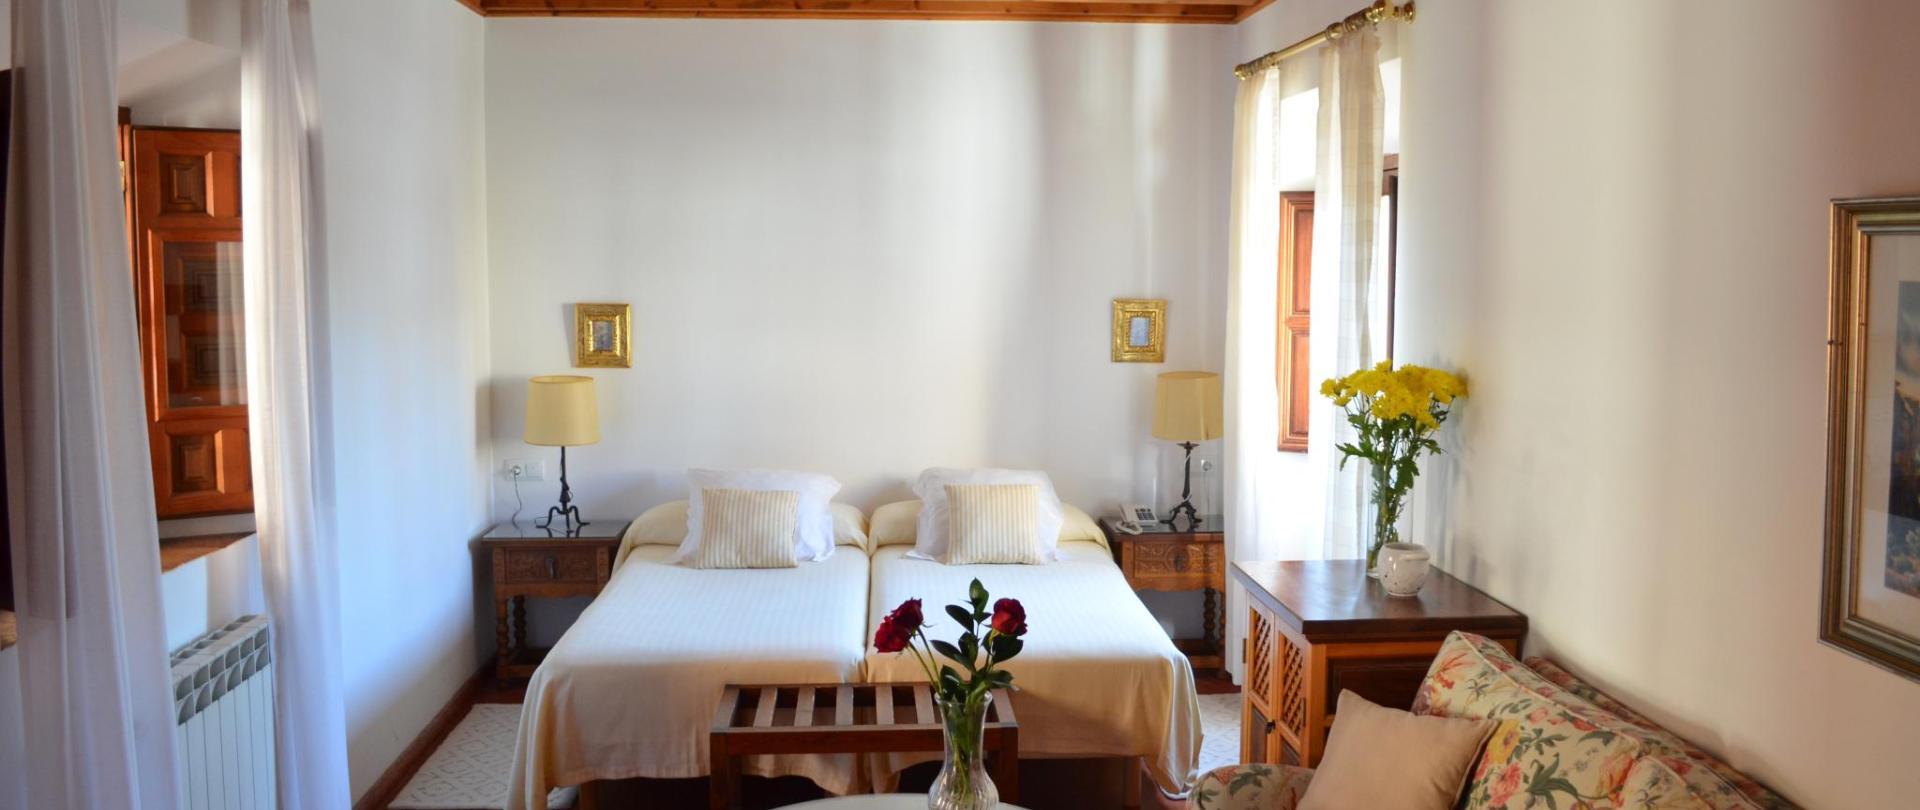 habitacion 6 - 2 camas.JPG